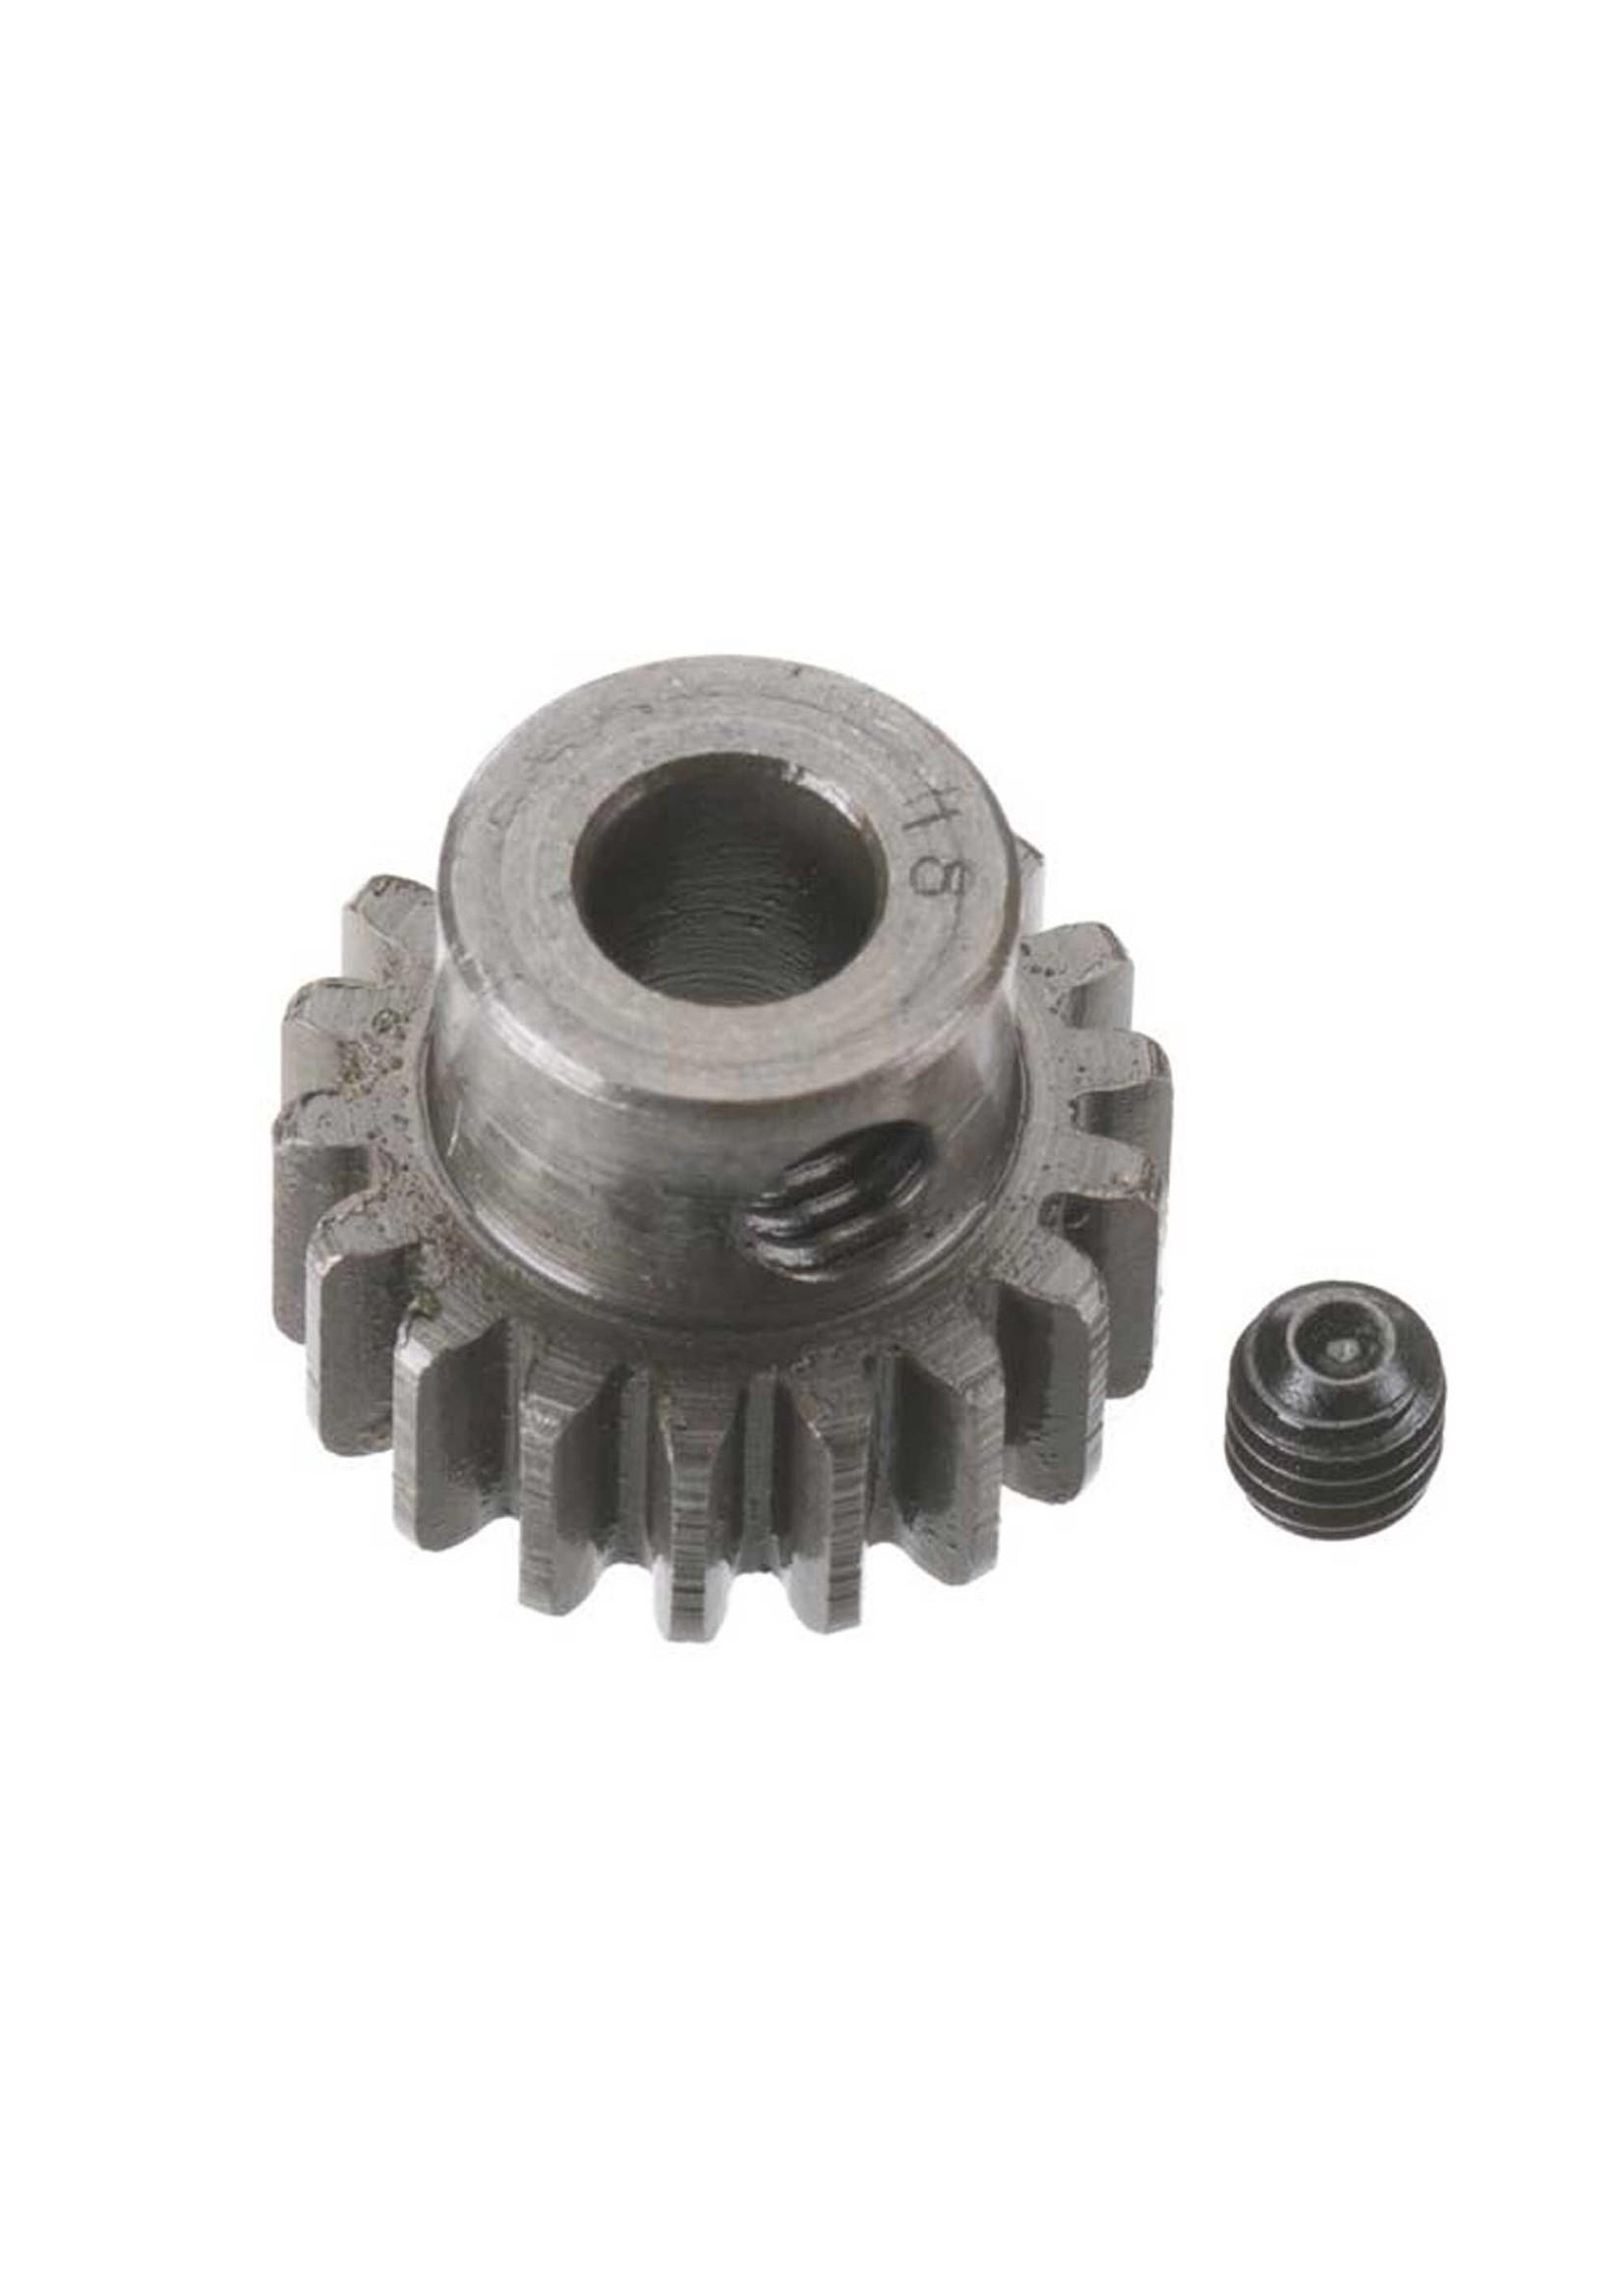 Robinson Racing Products RRP8718 Robinson Racing Extra Hard Steel .8 Mod Pinion Gear w/5mm Bore (18T)